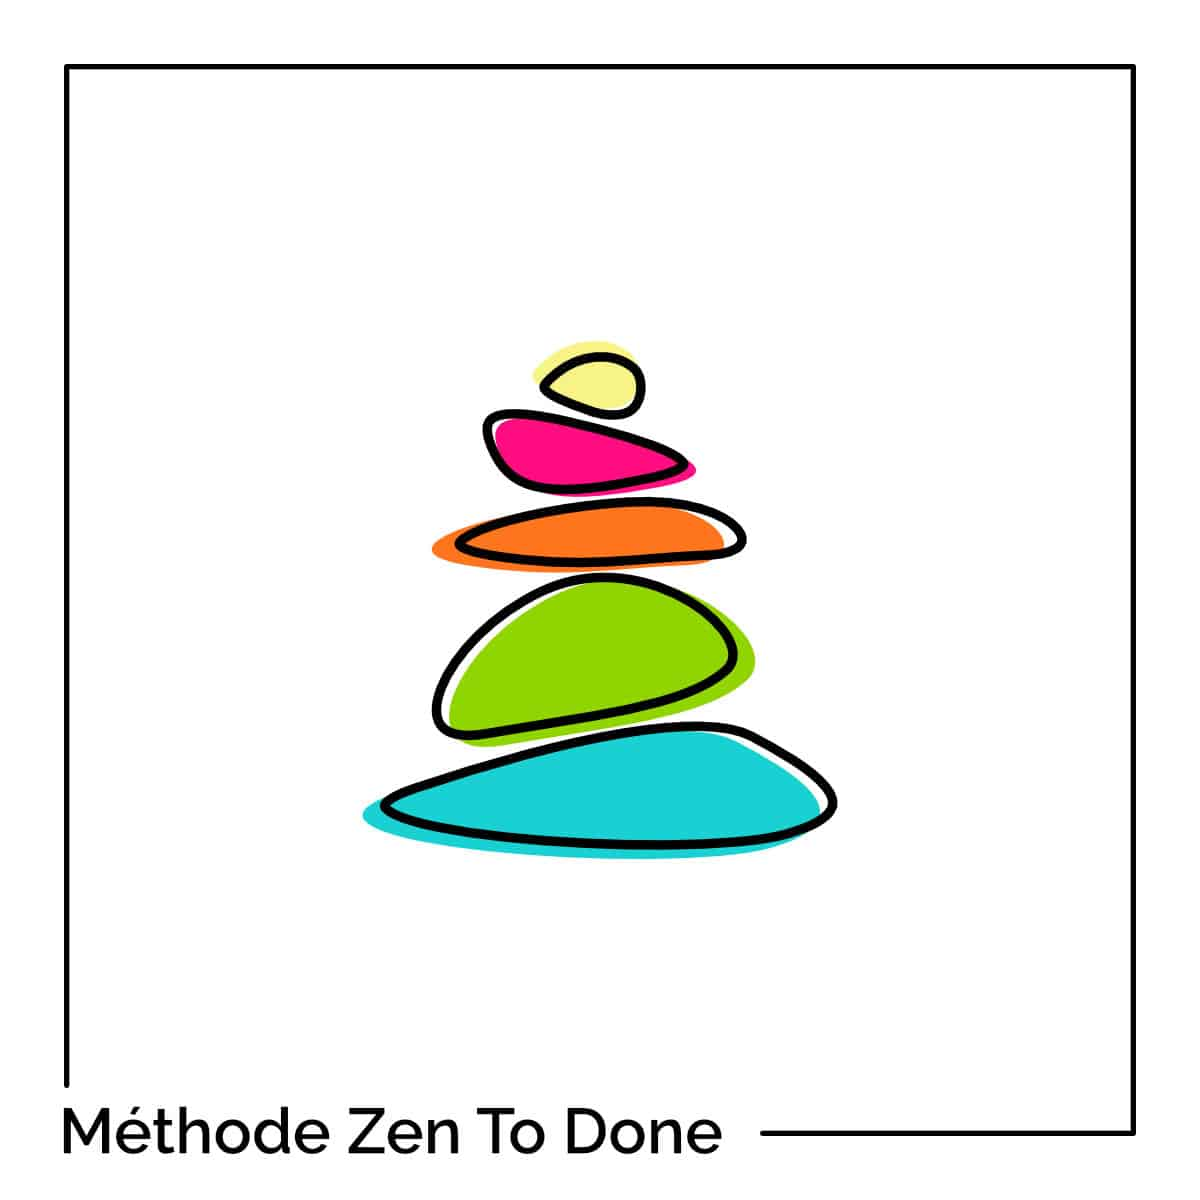 Méthode Zen To Done